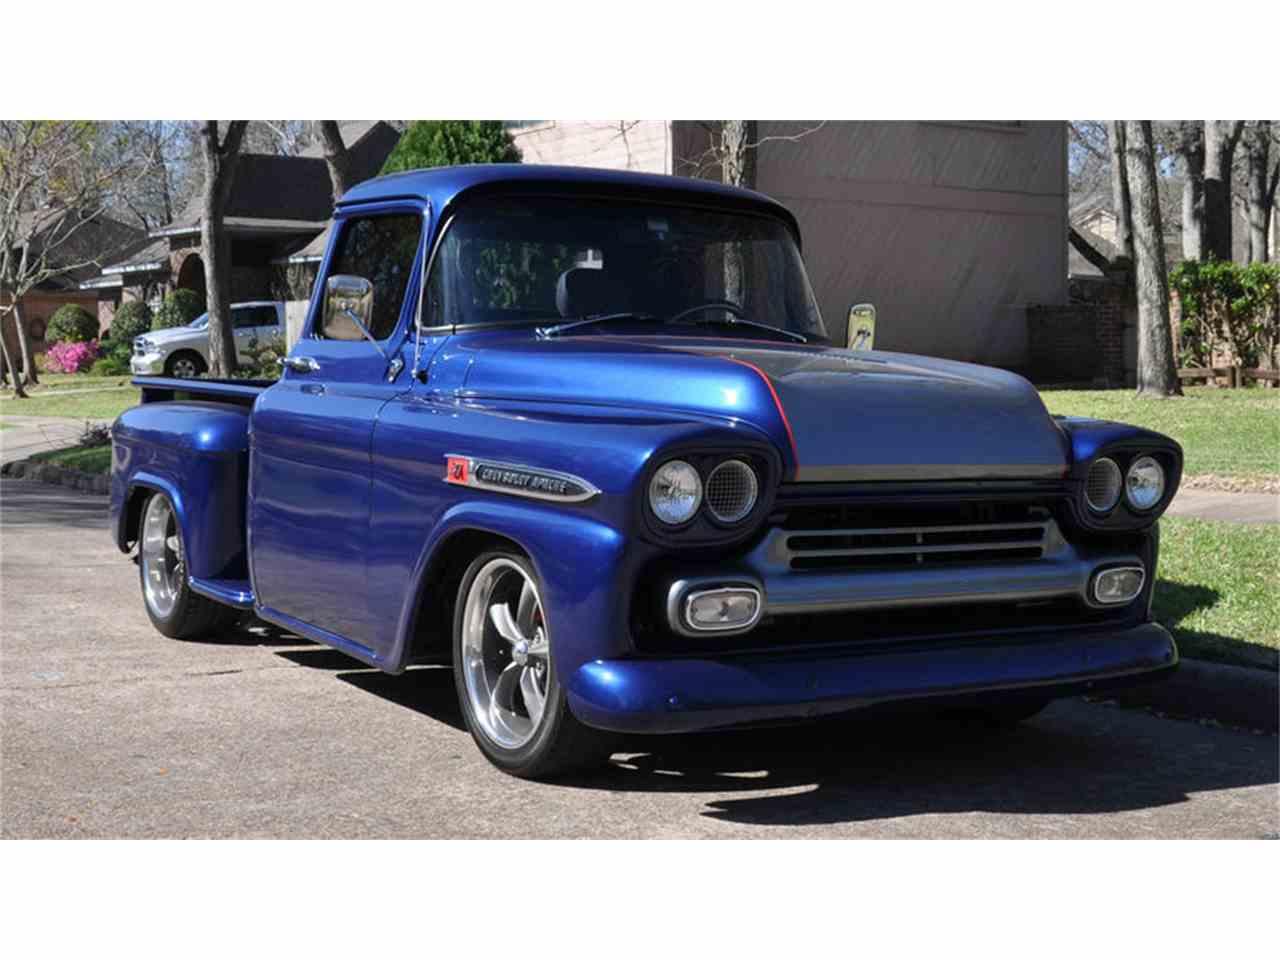 High Resolution Wallpaper | 1959 Chevrolet Apache 1280x960 px